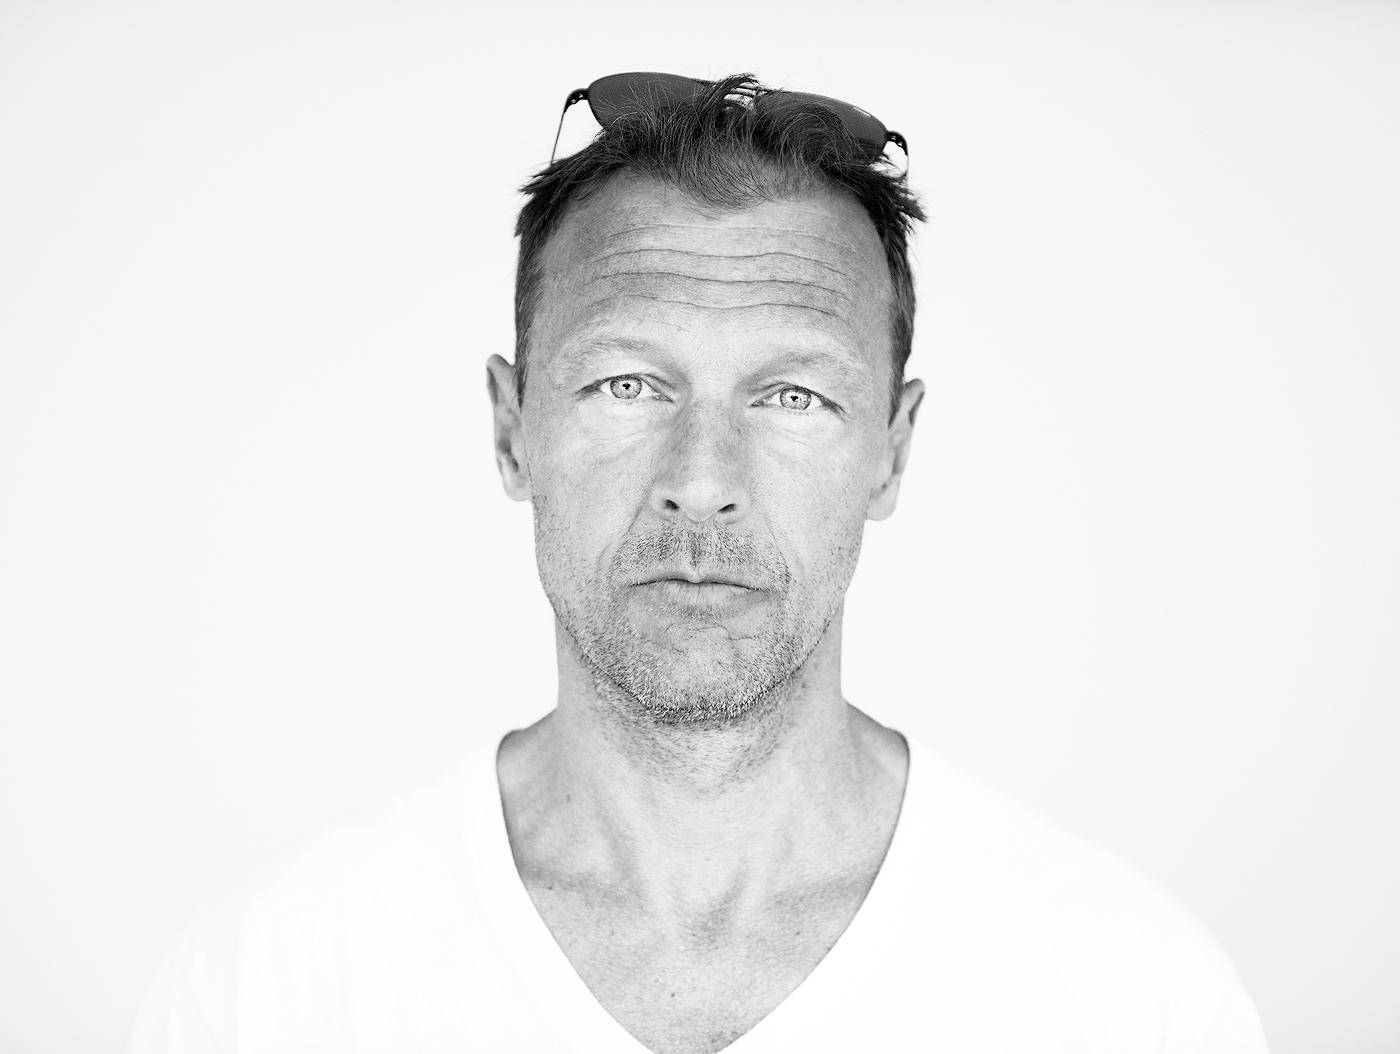 portreefotod portreed fotograaf Kristian Kruuser3.jpg